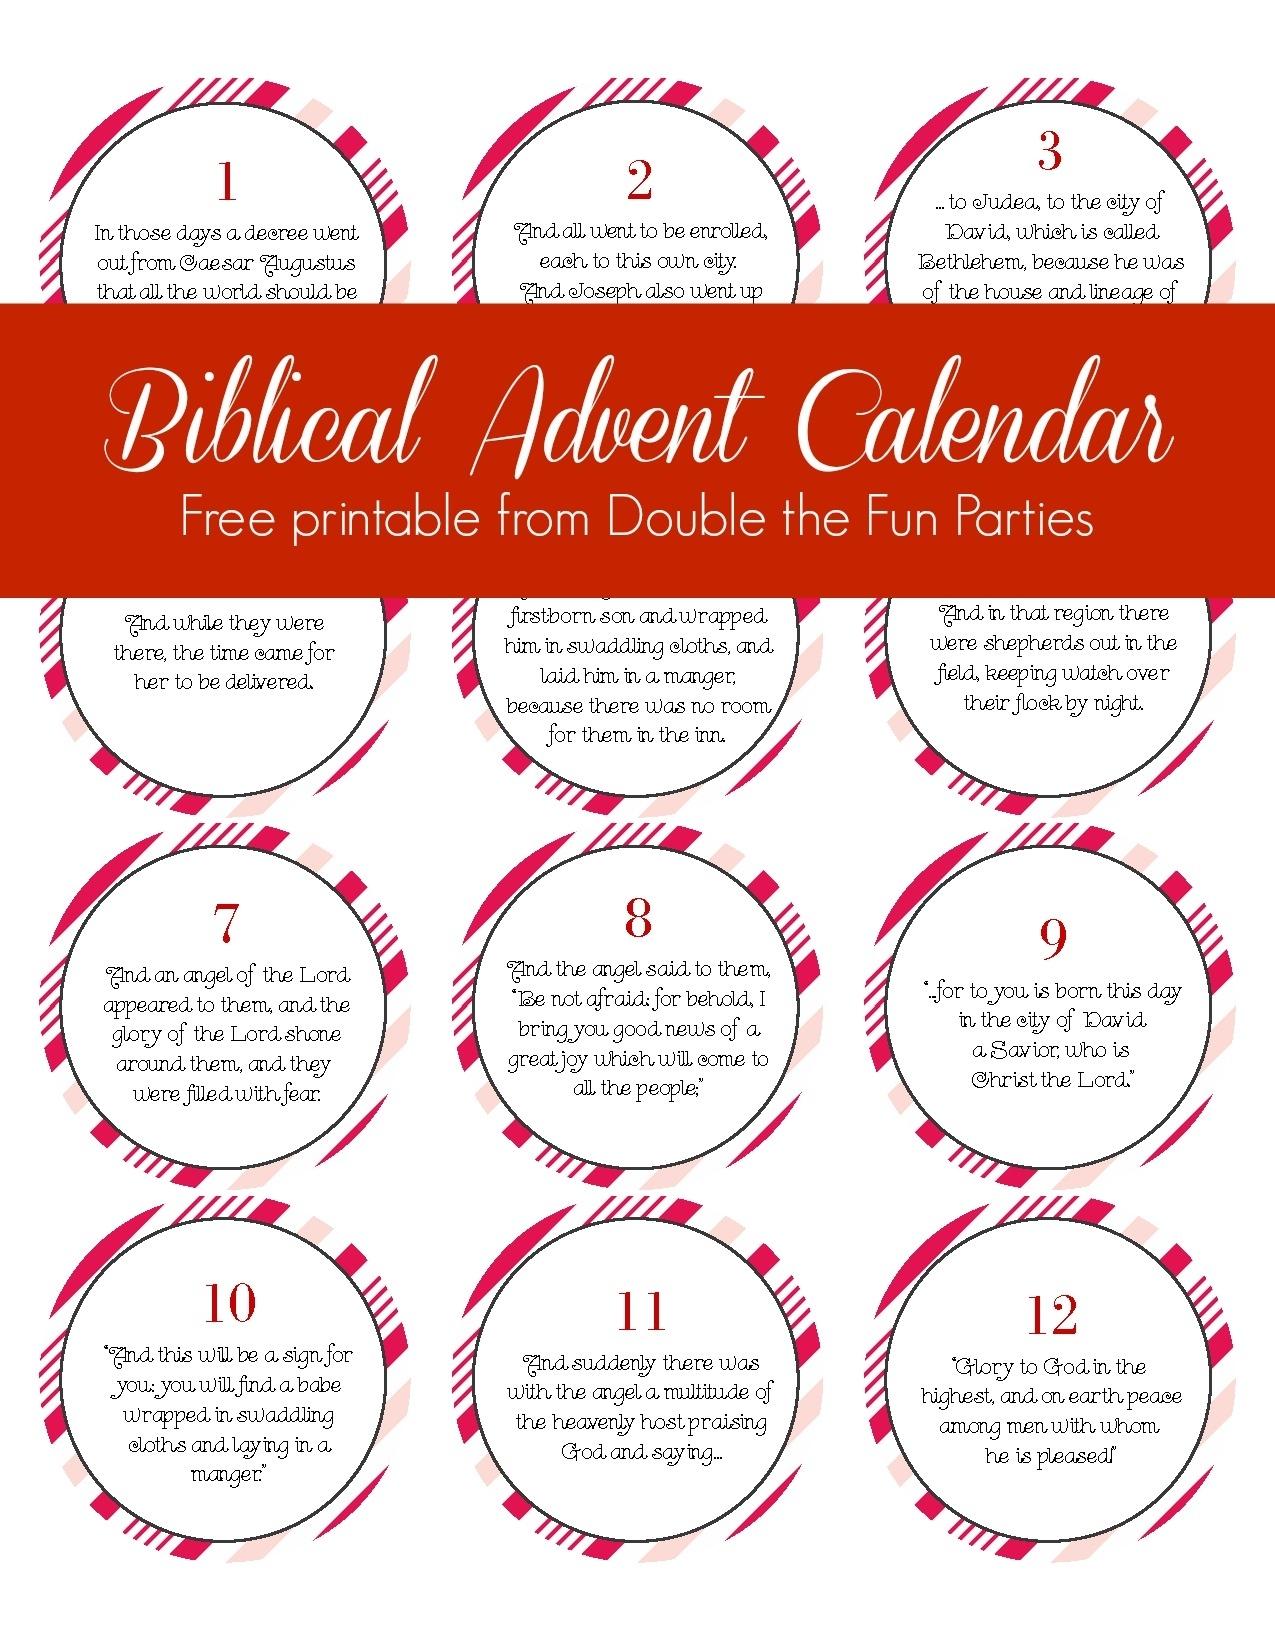 Free Biblical Advent Calendar Printable with Diy Print Bible Verse Advent Calander